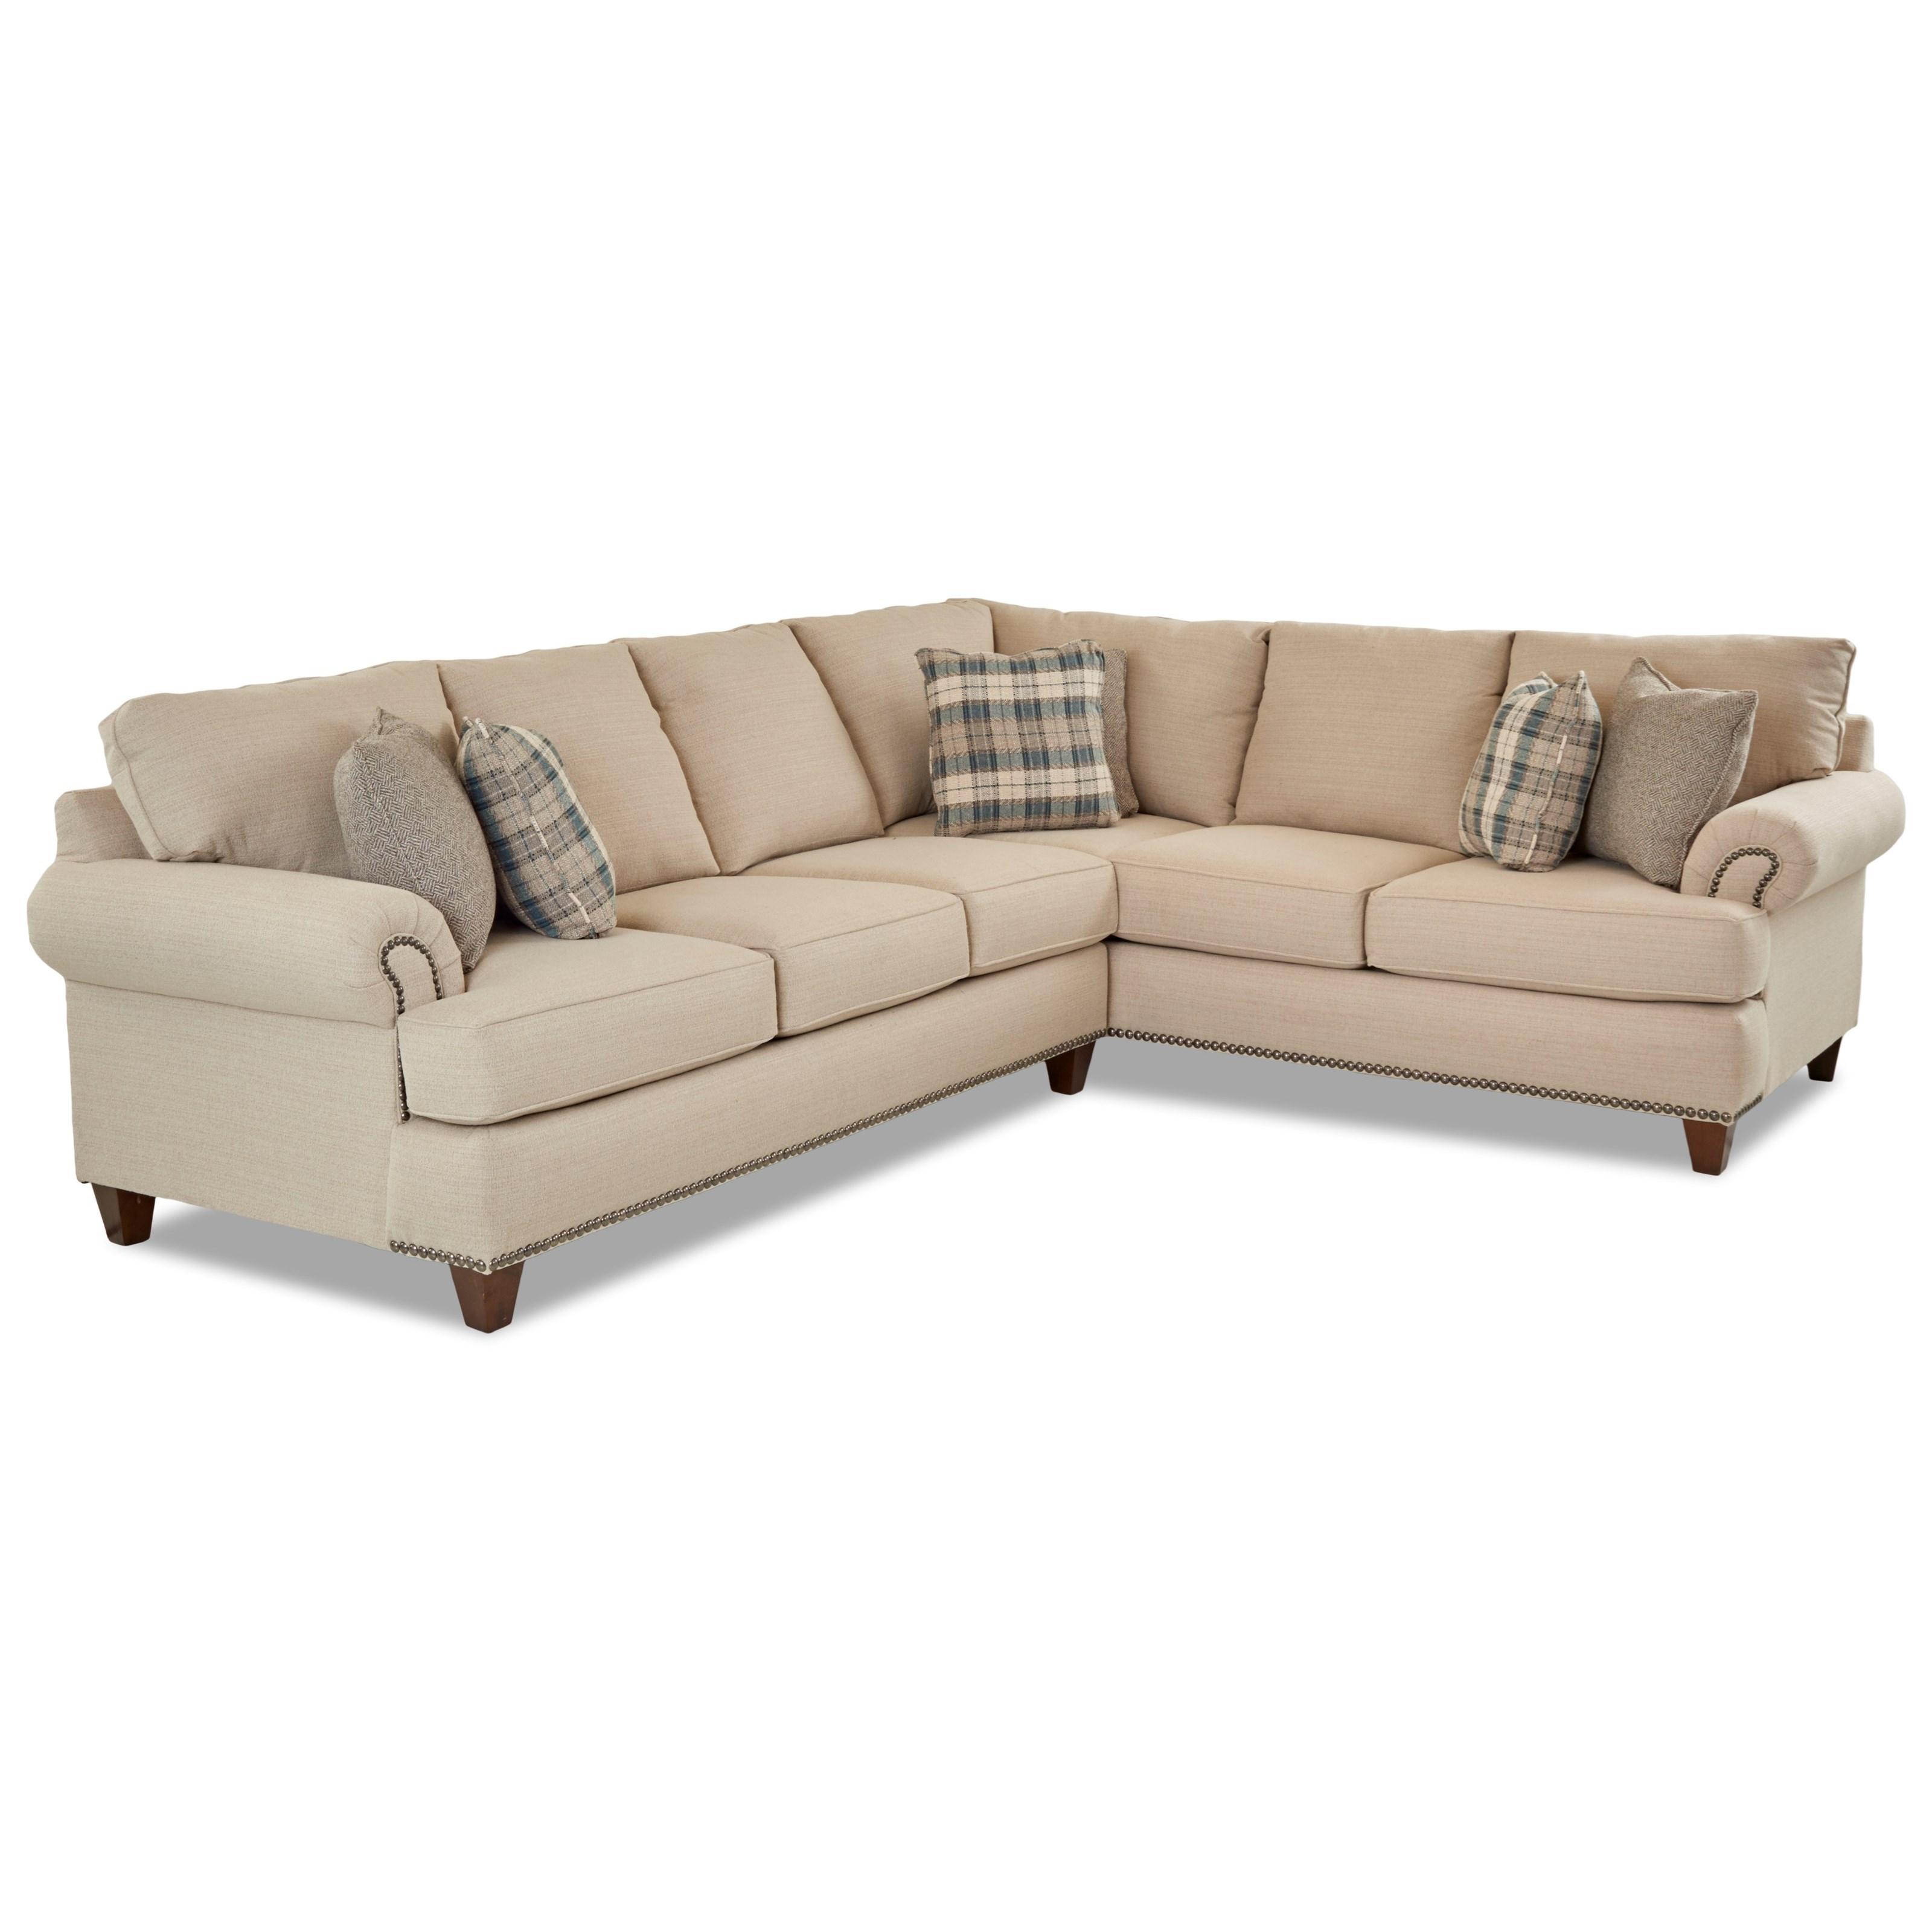 Alexa 2 Pc Sectional Sofa w/ LAF Sofa by Klaussner at Pilgrim Furniture City